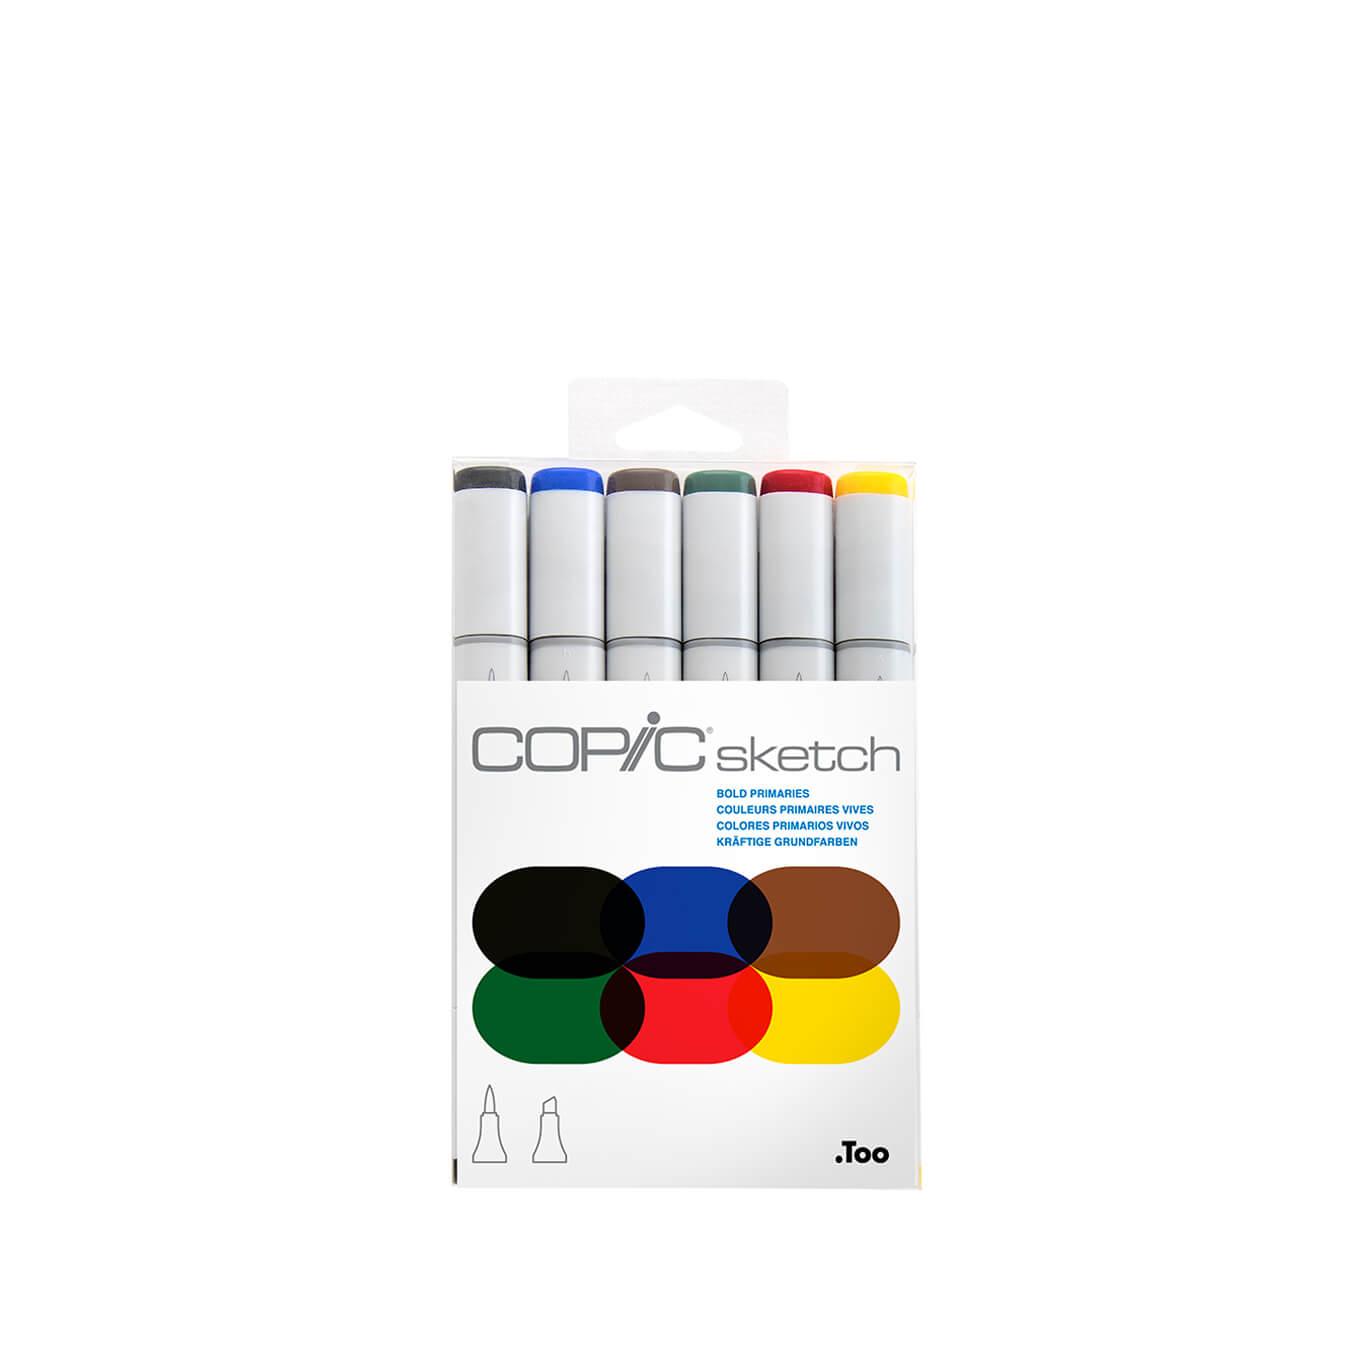 Copic Sketch 6 colors set Bold Primaries